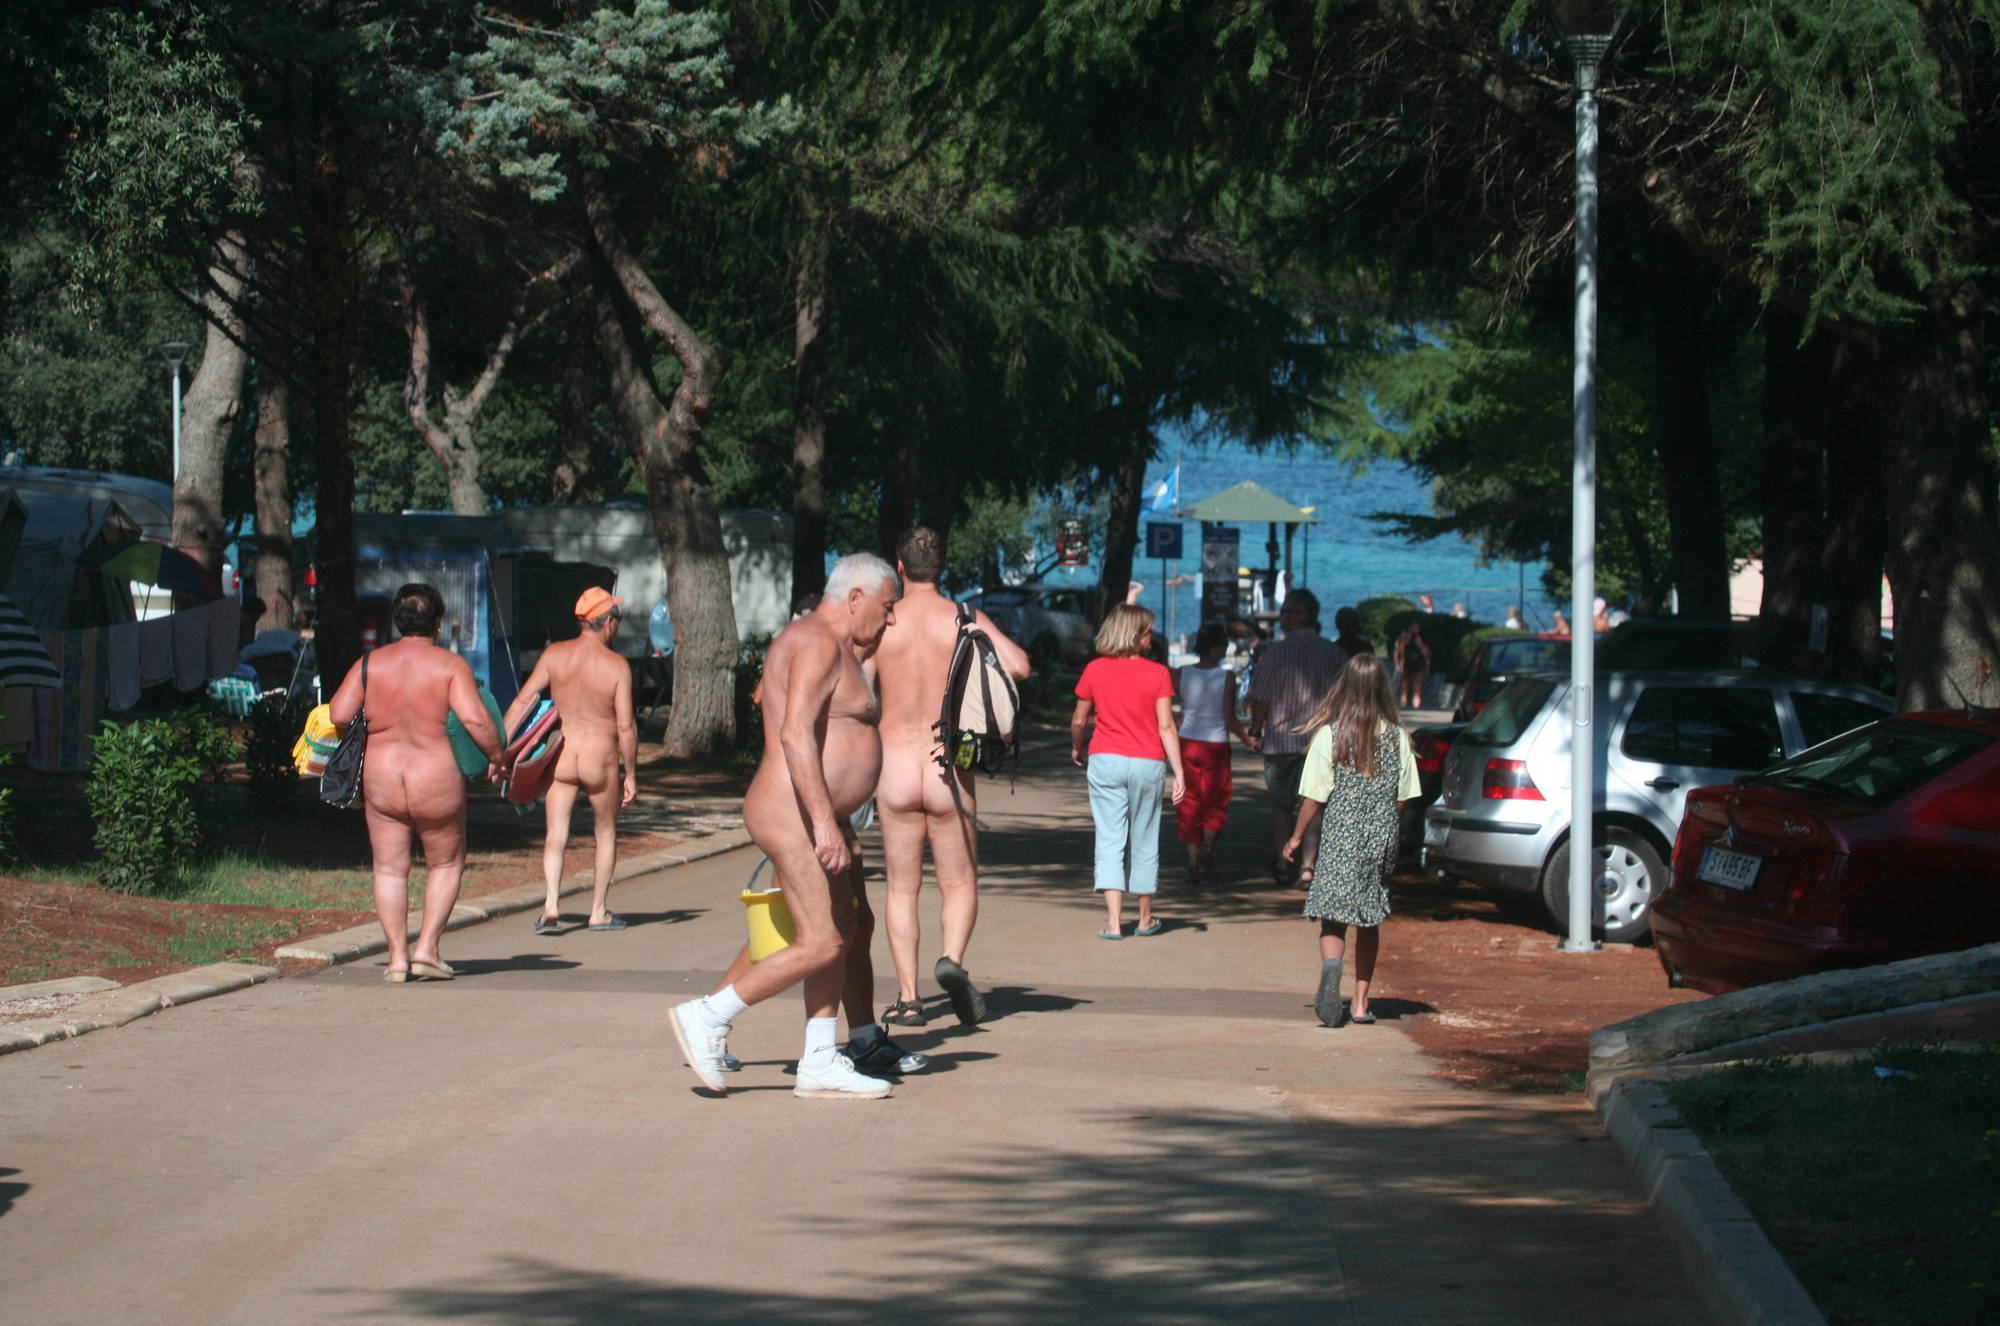 Nudist Photos Pier FKK Park In Motion - 2